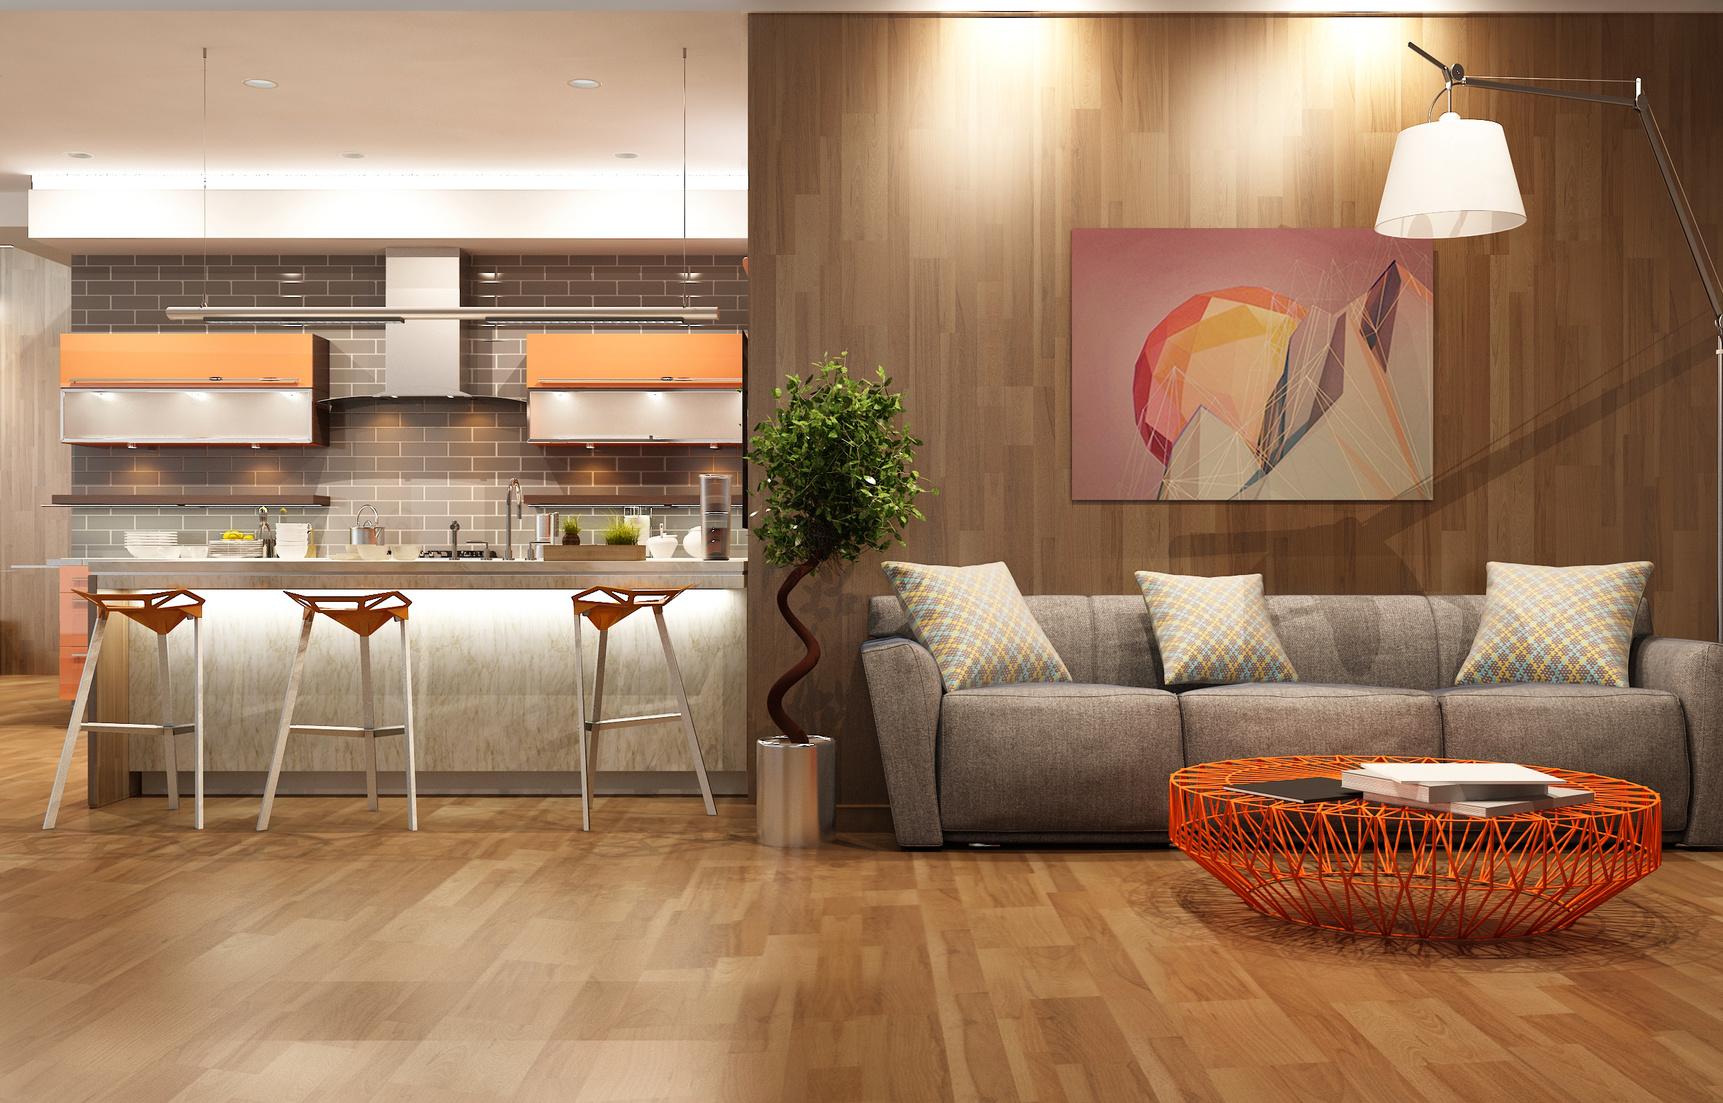 Hardwood flooring installation in a Colorado home